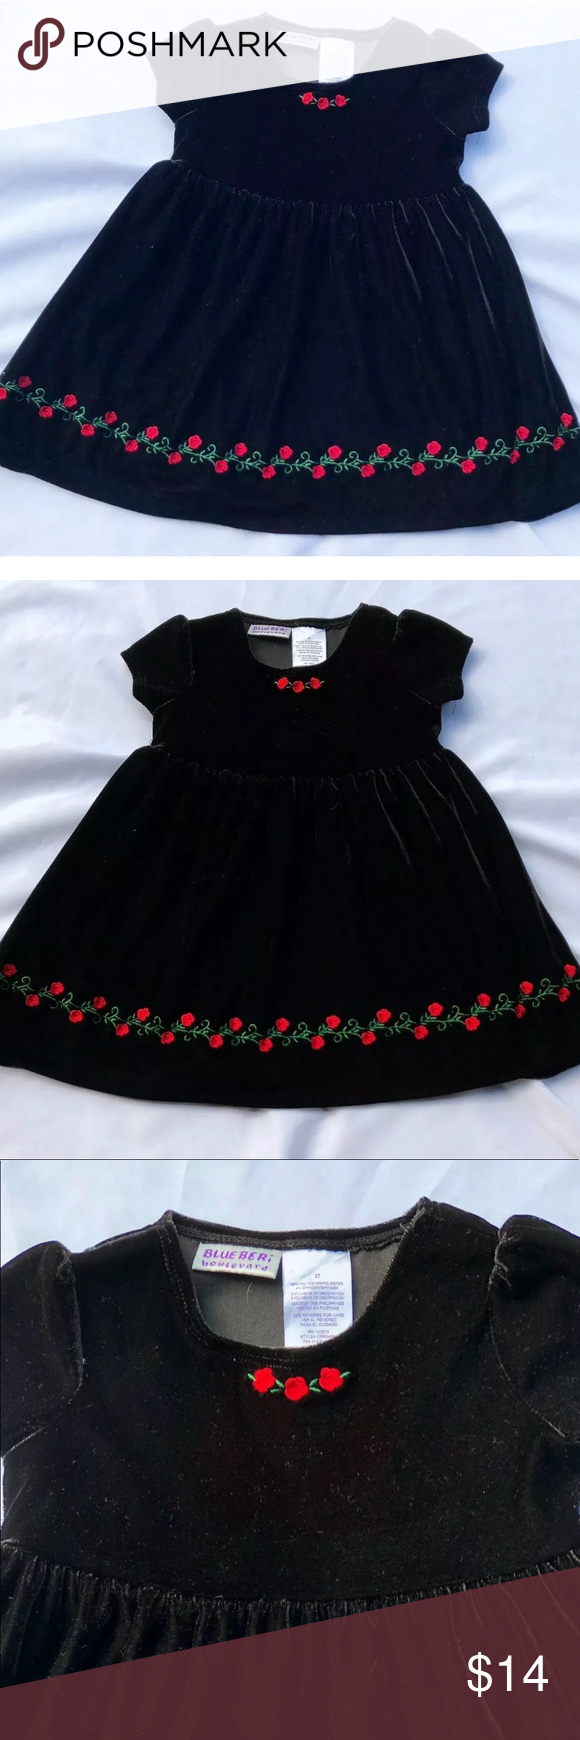 4 25 Blueberri Blvd Black Holiday Dress 2t Black Holiday Dress Holiday Dresses Kids Dresses [ 1740 x 580 Pixel ]